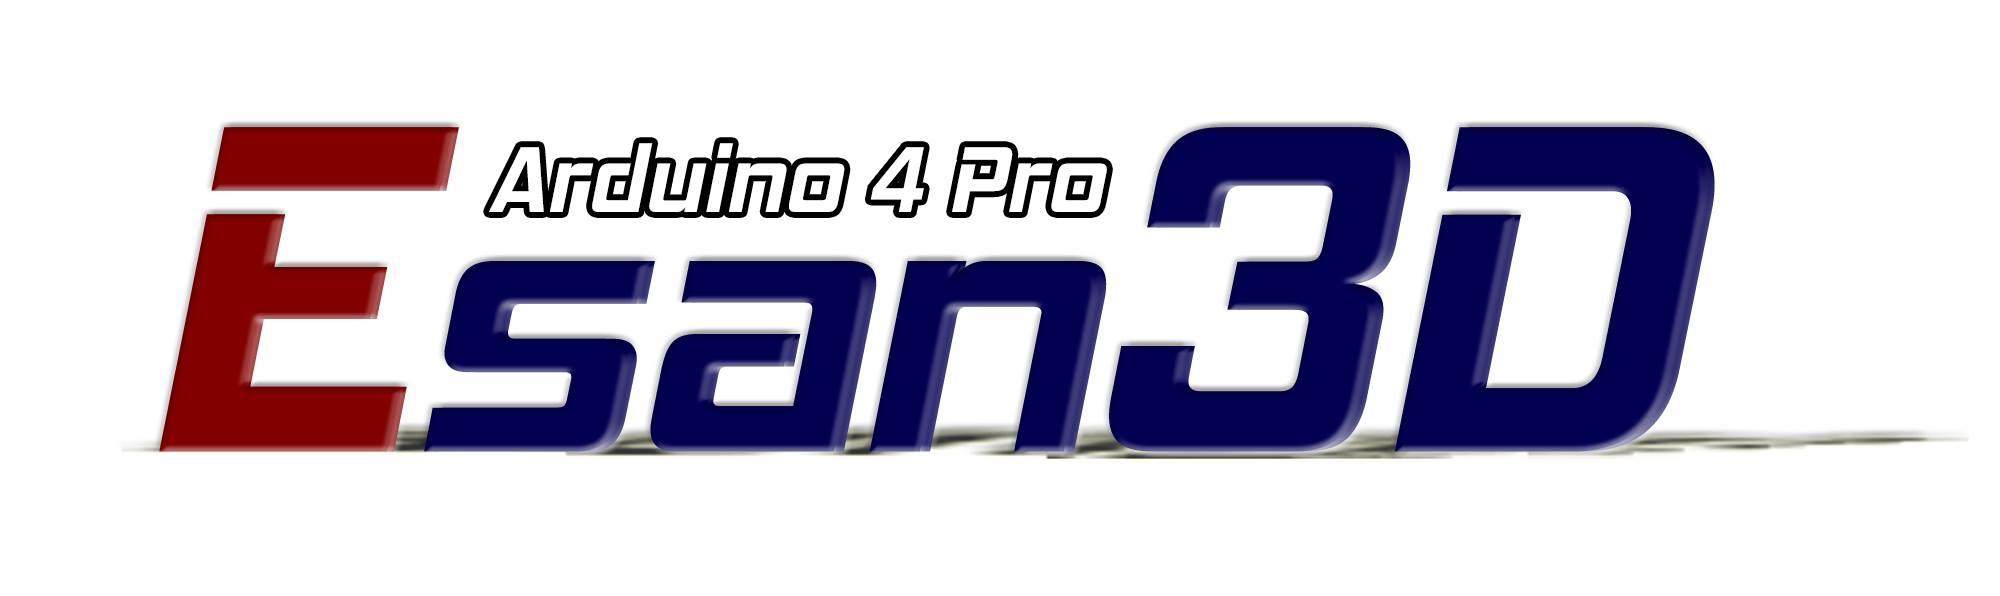 http://www.arduino4pro.com/